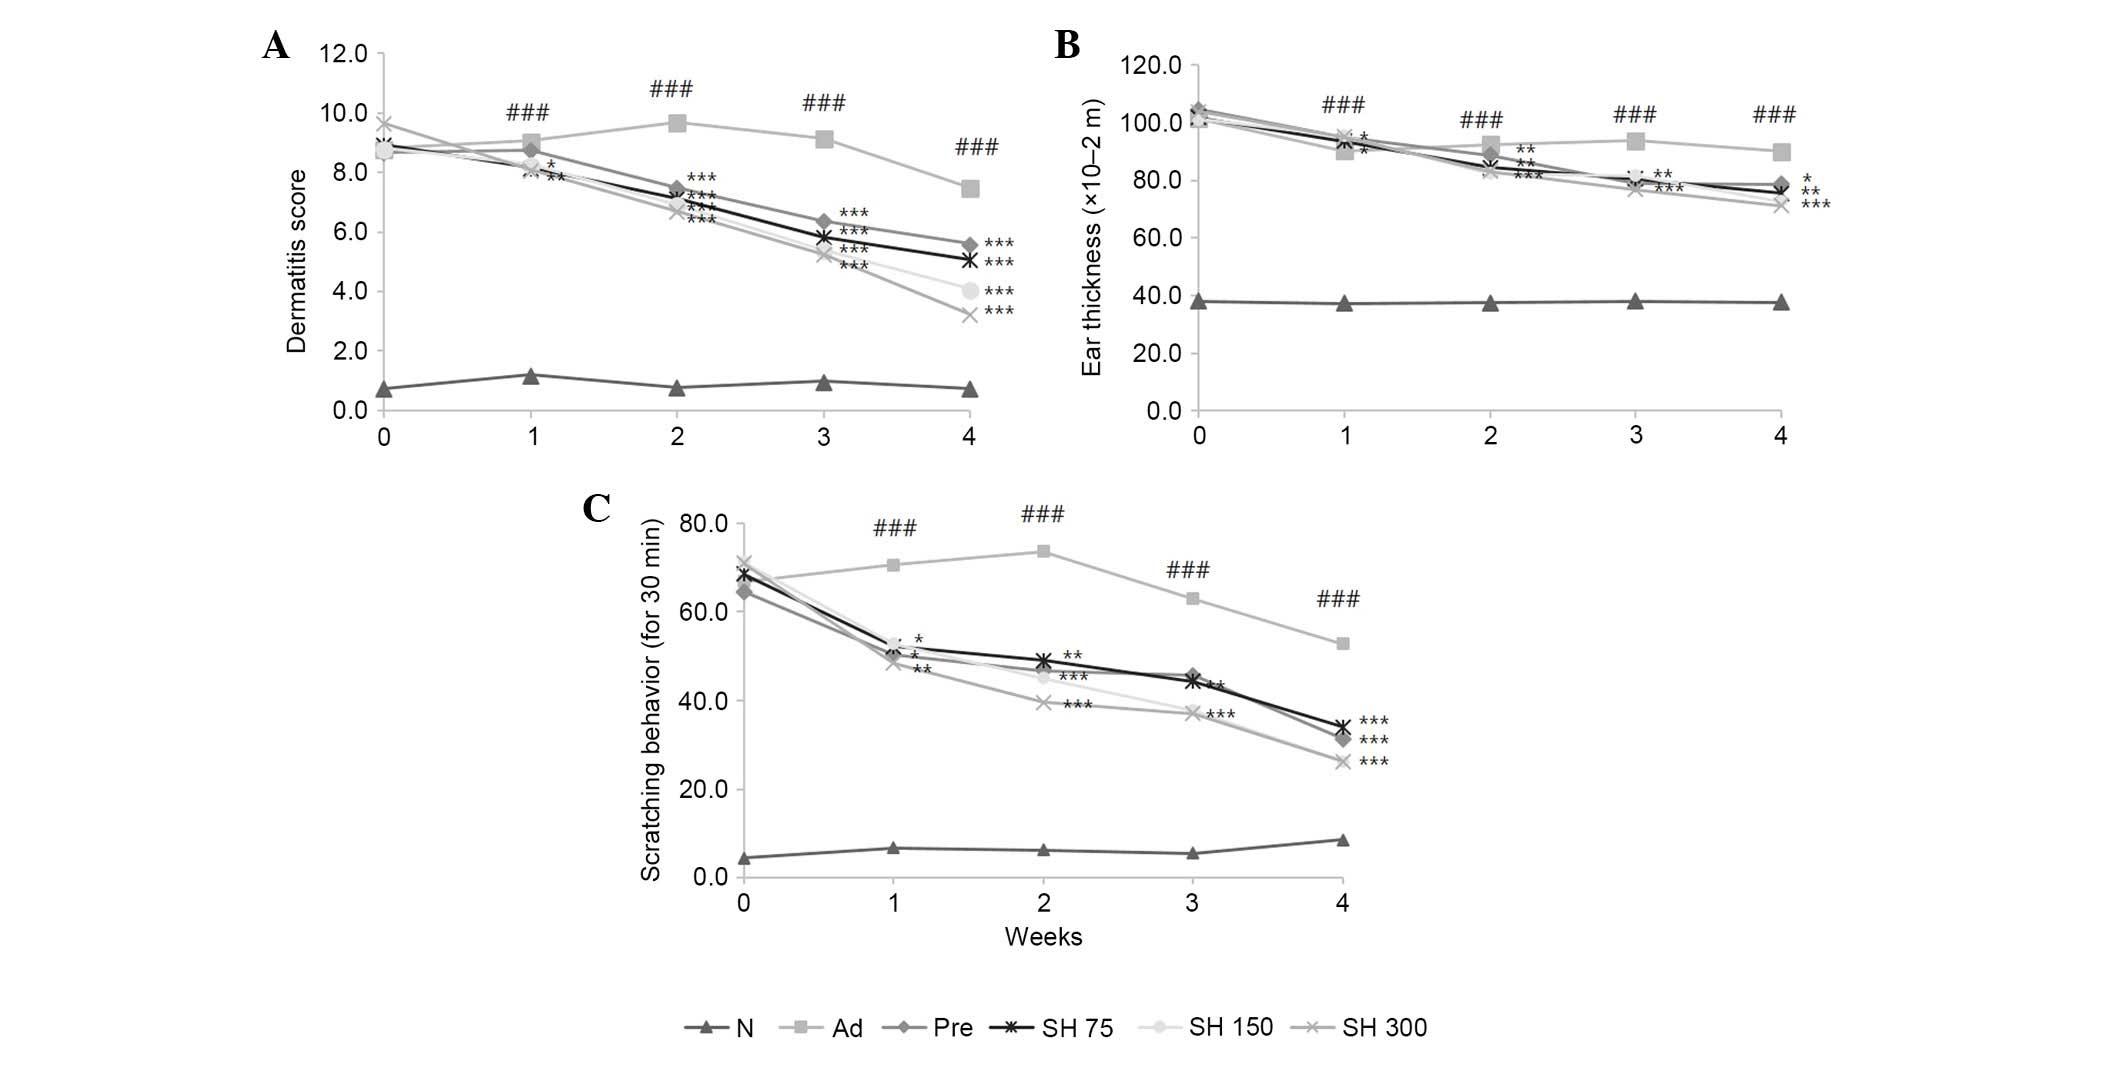 Solanum Tuberosum L Cv Hongyoung Extract Inhibits 24 Potato Gun Diagram Figure 4 Effects Of Sh On A Dermatitis Score B Ear Thickness And C Scratching Behavior